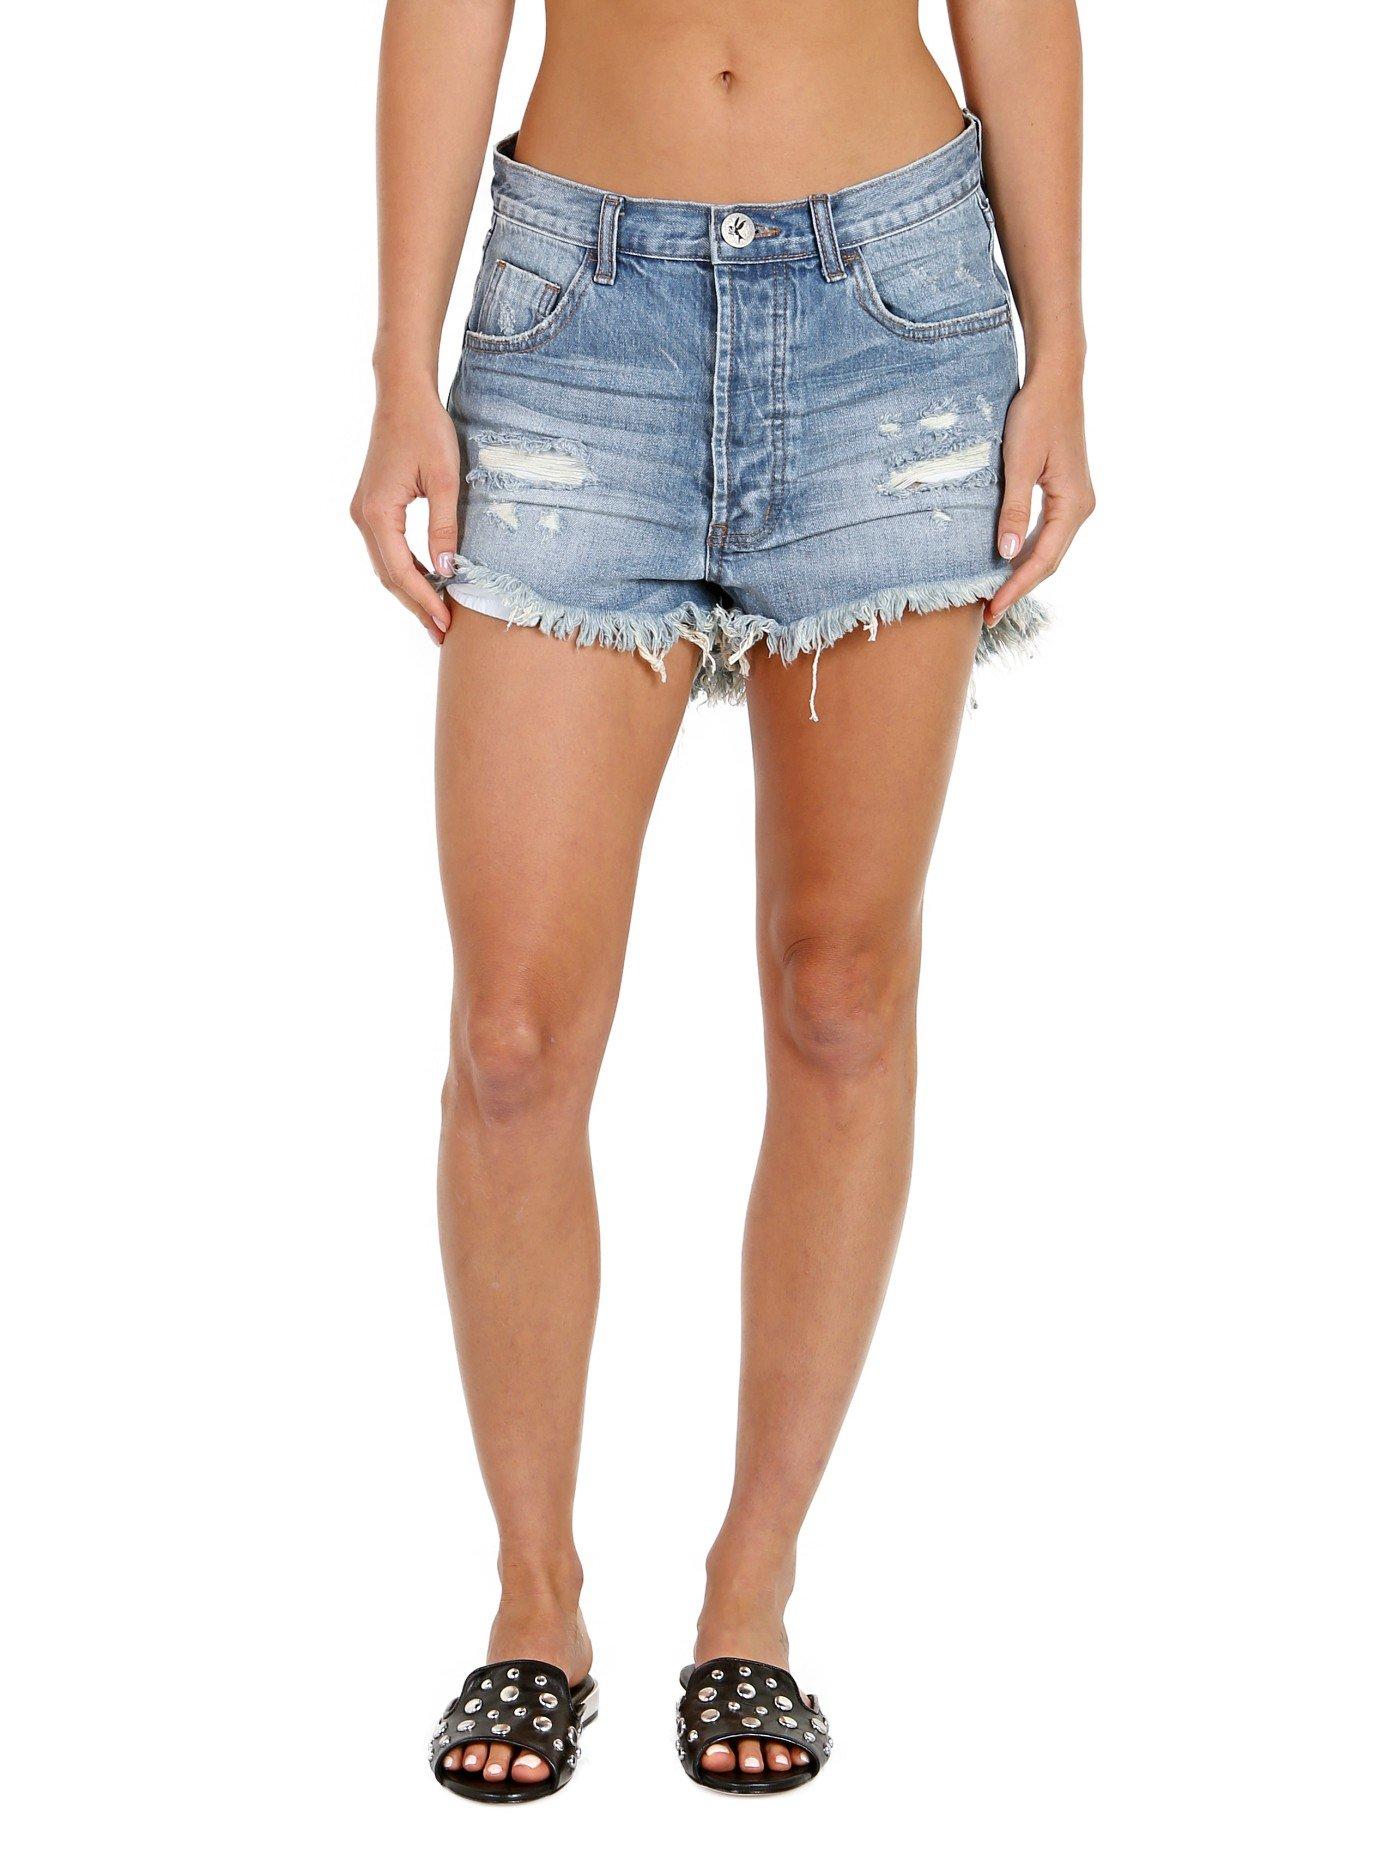 One Teaspoon Women's Outlaws Shorts, Johnnie Blue, 25